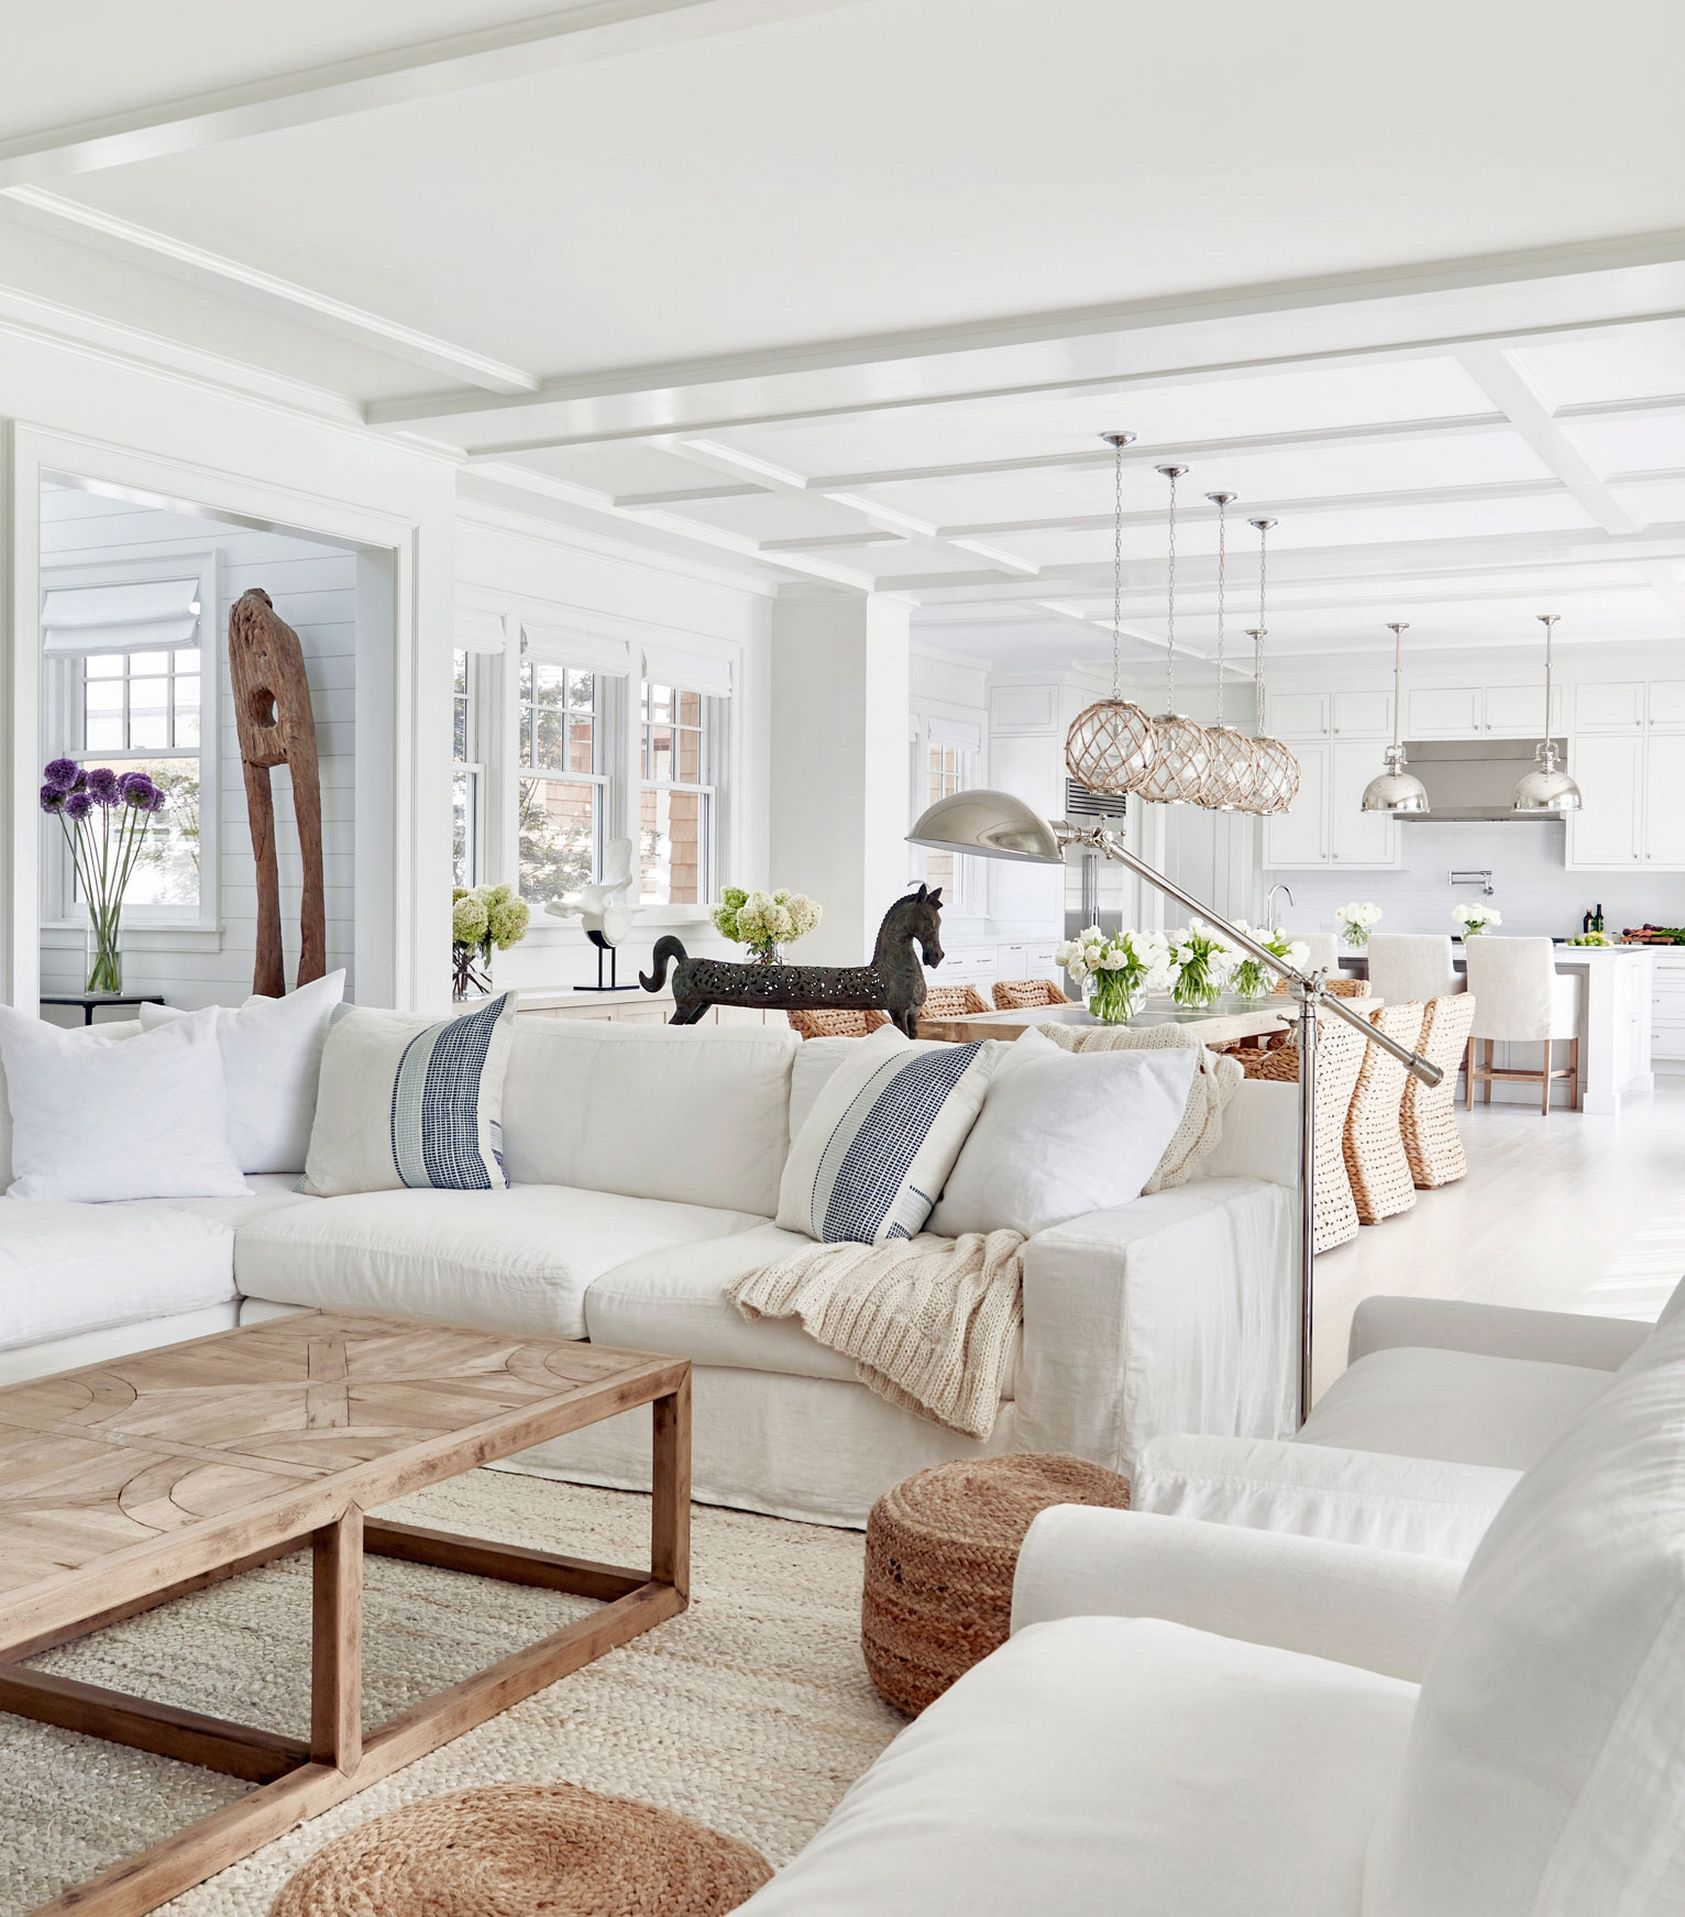 90+ Chic Beach House Interior Design Ideas | Pinterest | Chic beach ...